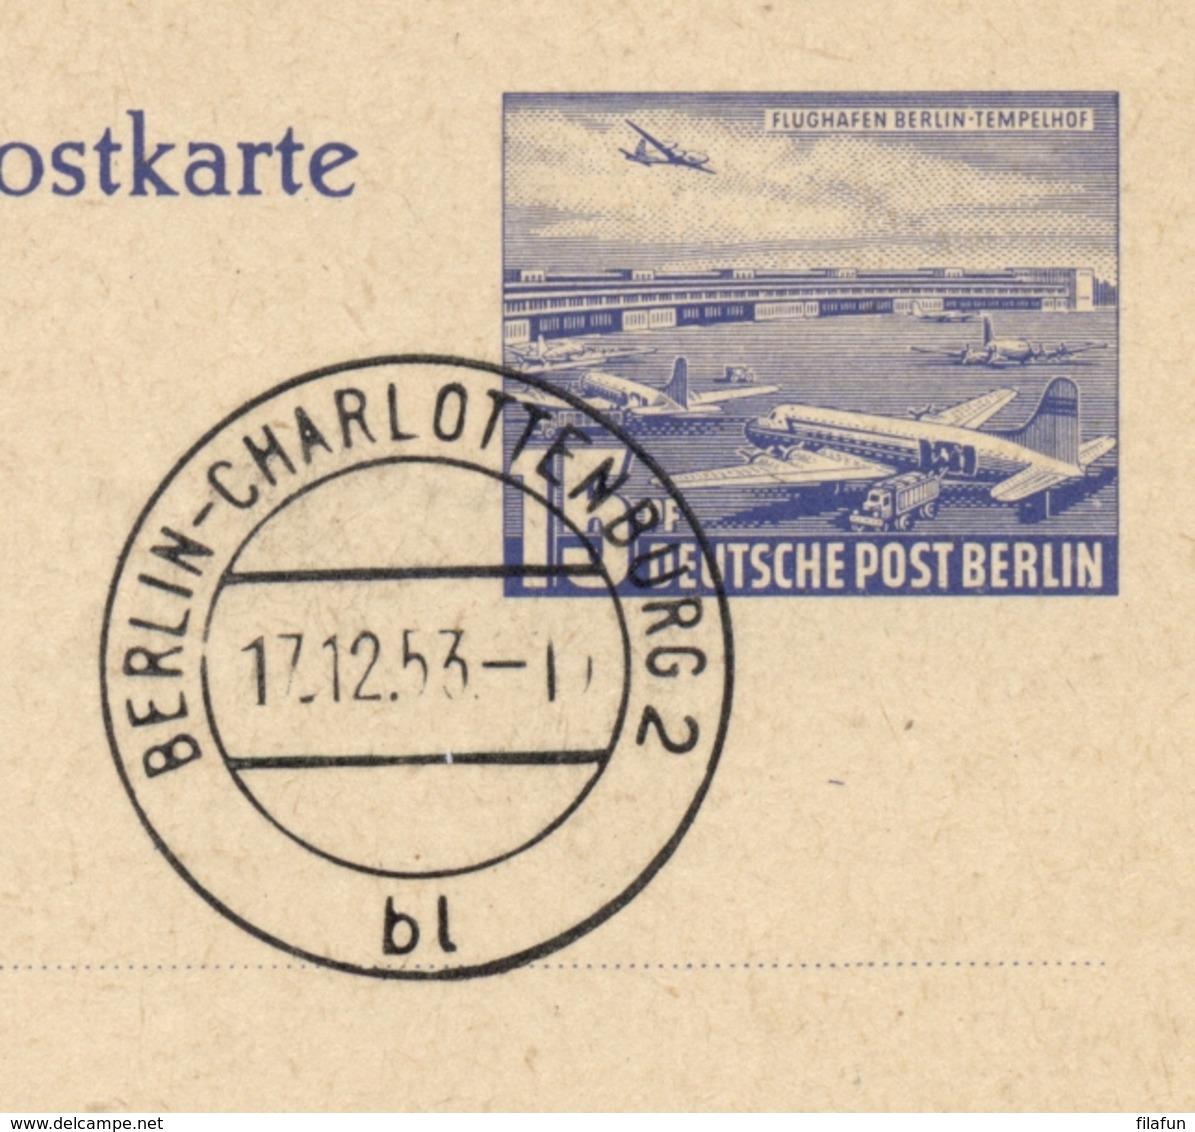 Berlin - 1953 - 15pf Luftpostkarte - Flughafen Berlin Tempelhof - Cancelled FDC, Not Sent - [5] Berlijn